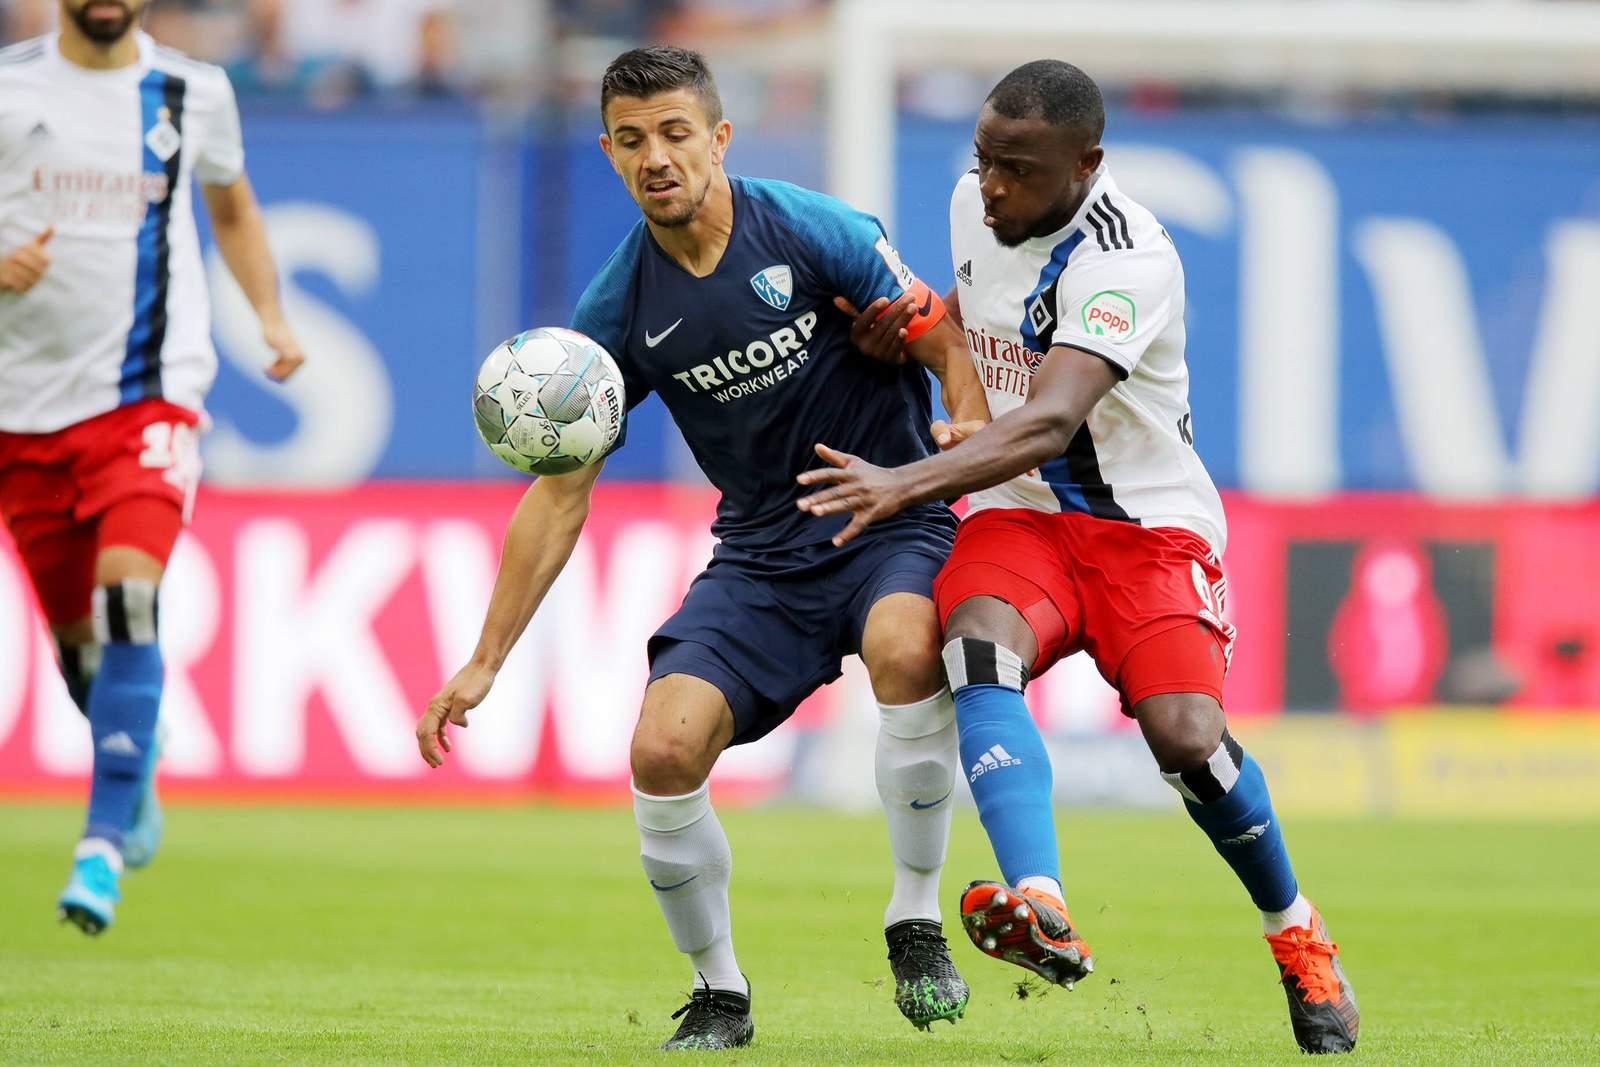 Danilo Soares vom VfL Bochum gegen David Kinsombi vom HSV